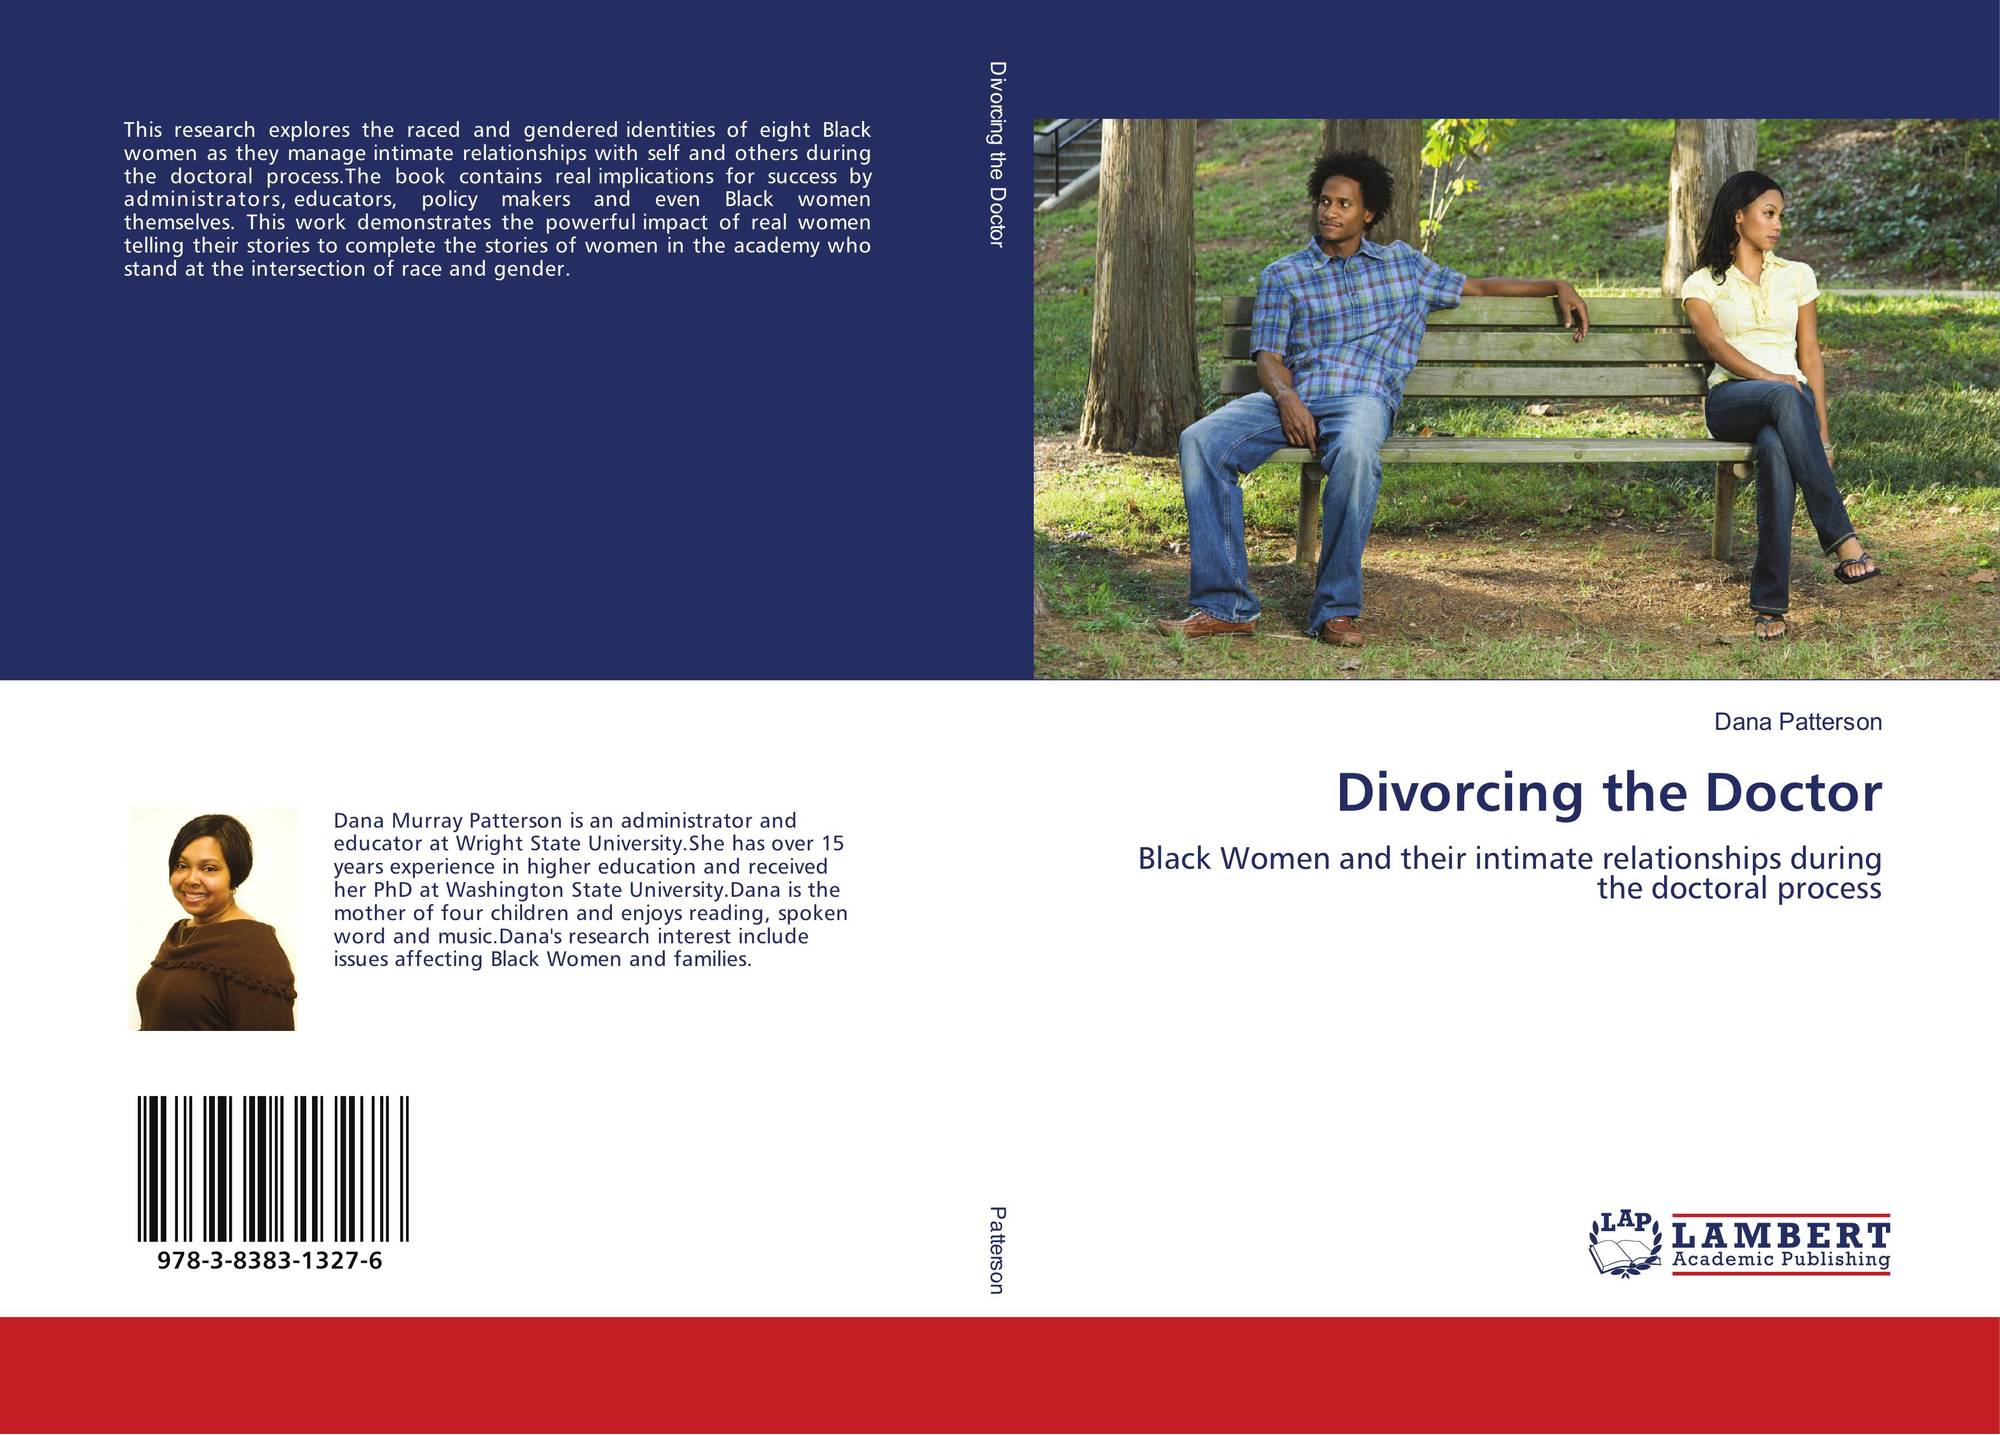 Divorcing the Doctor, 978-3-8383-1327-6, 3838313275